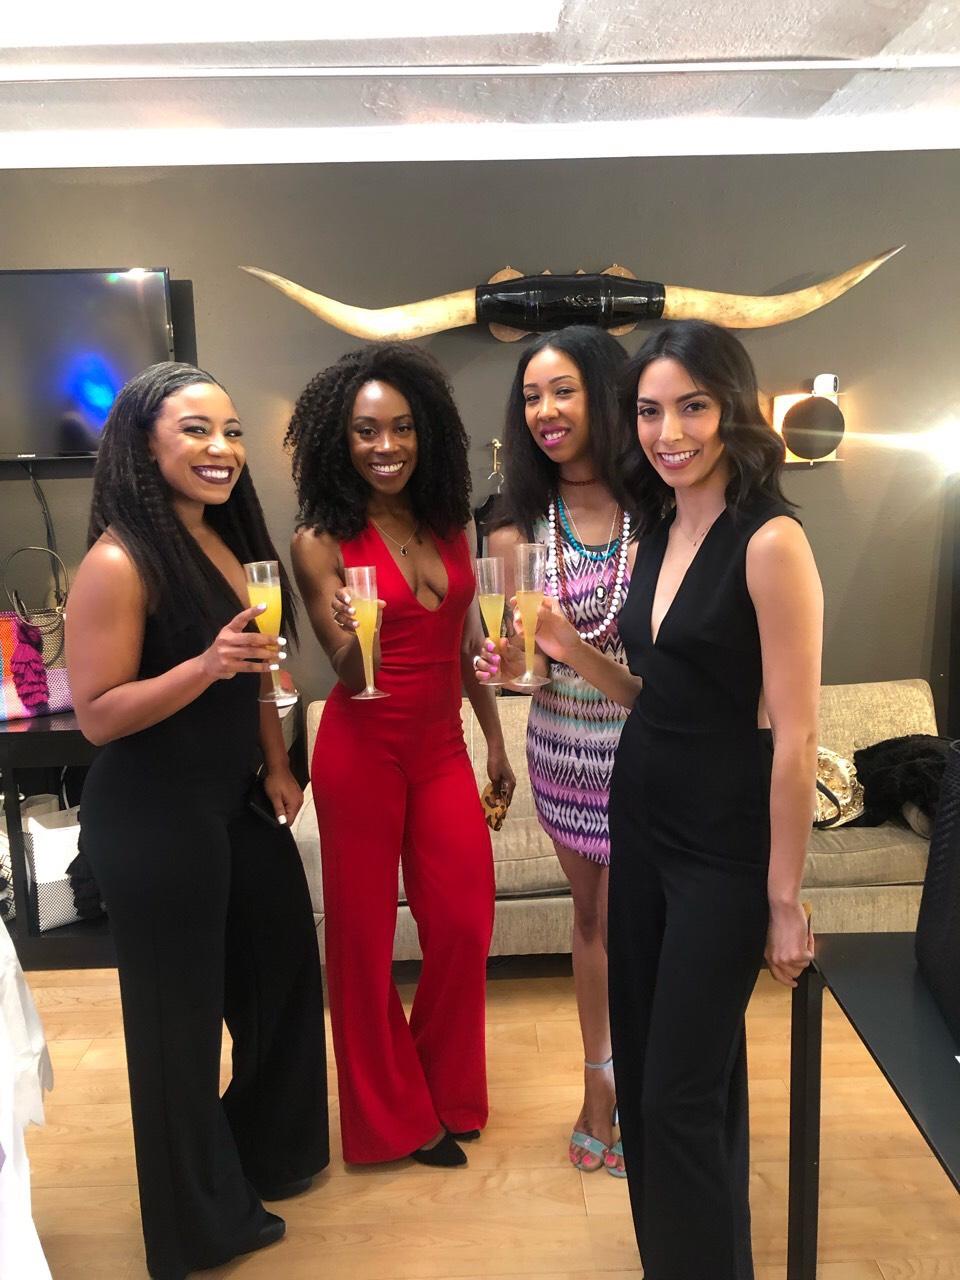 Socialites (L-R): Alexis, Danetha, Vanita, Alejandra